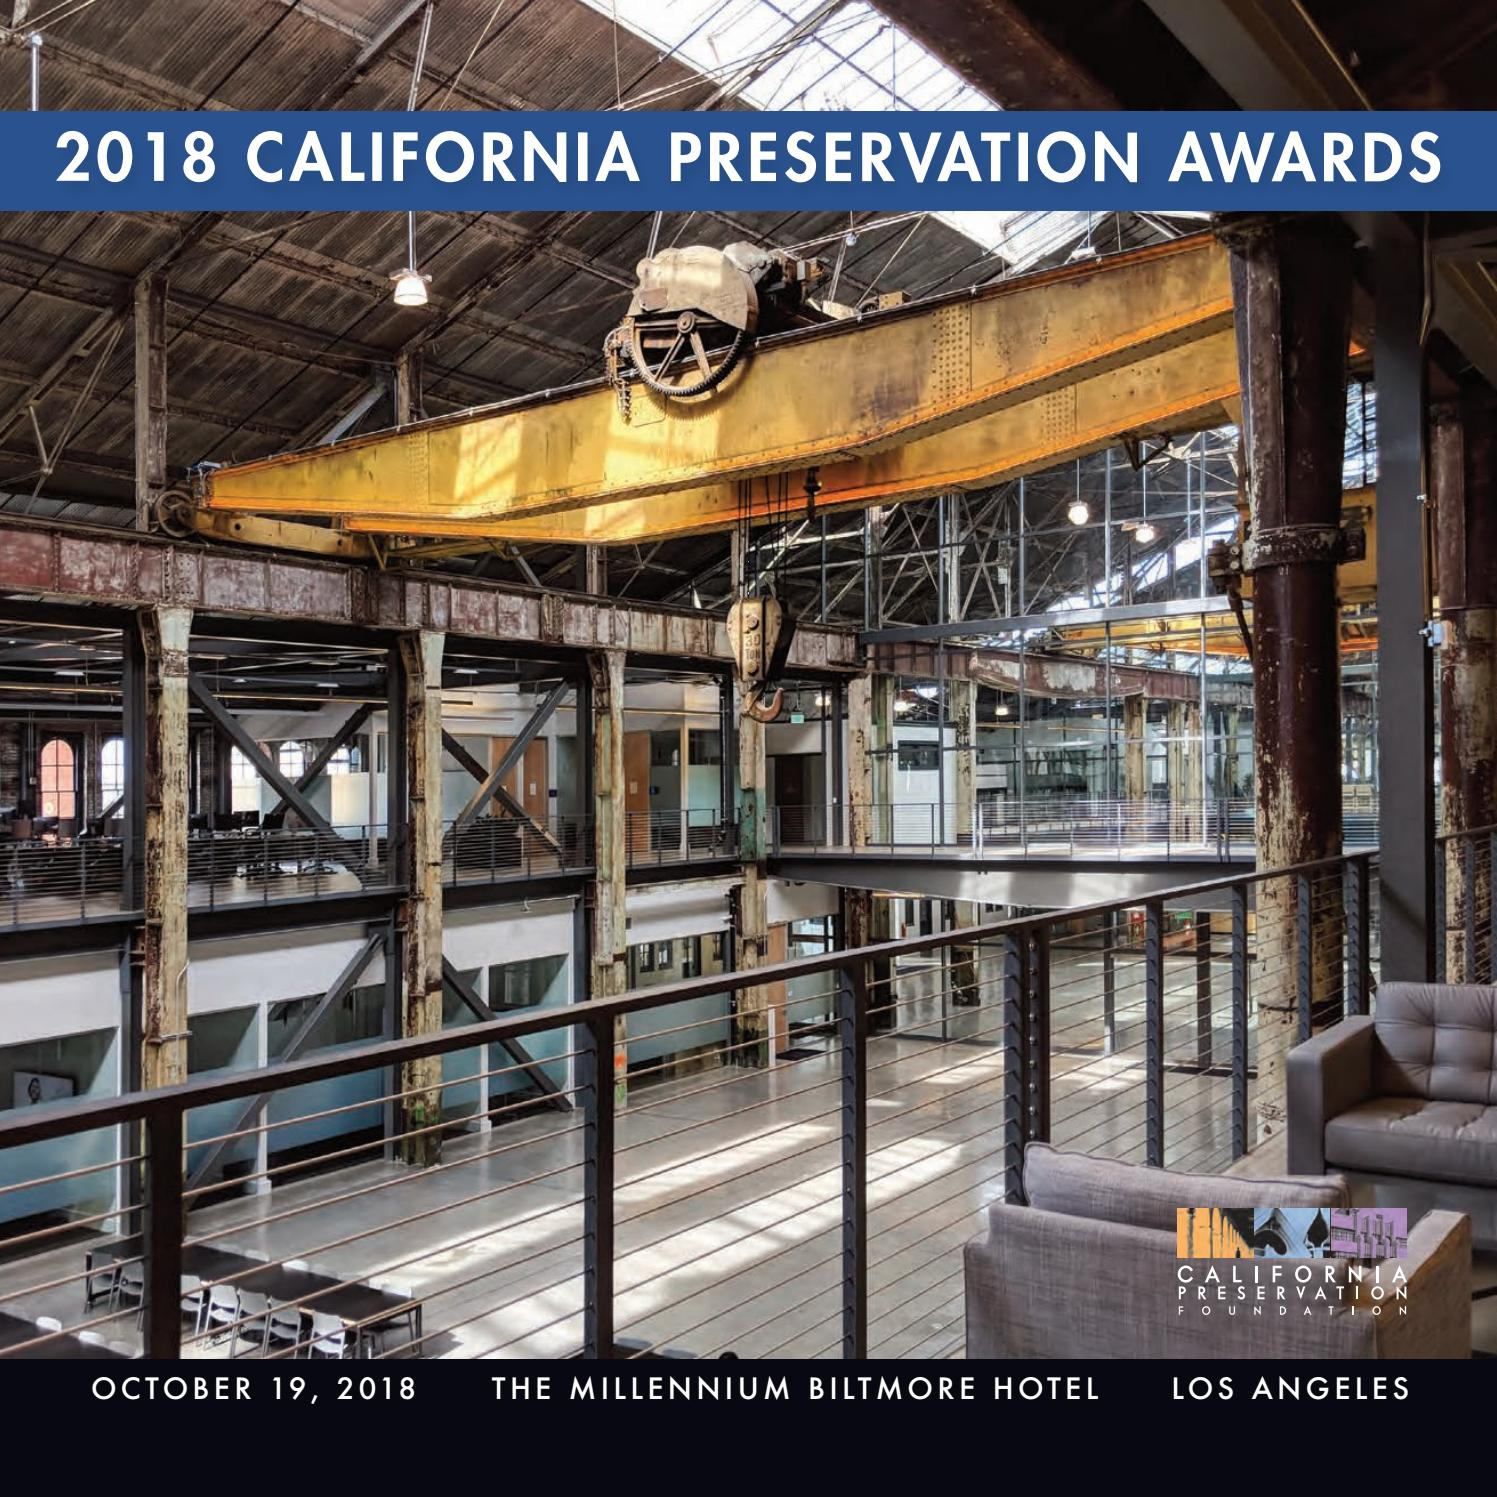 2018 California Preservation Awards by California